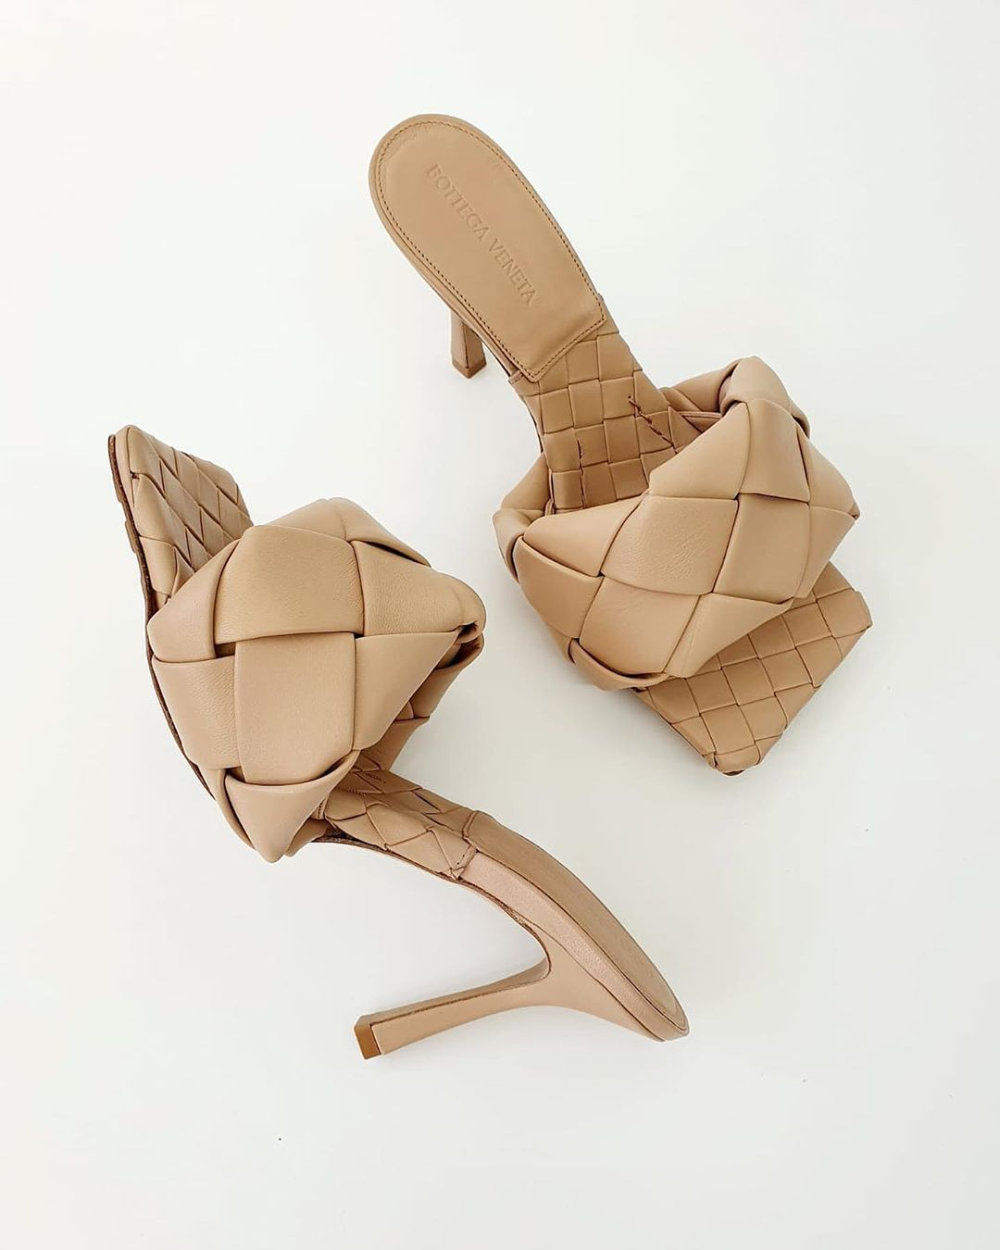 Bottega Veneta heels by Daniel Lee